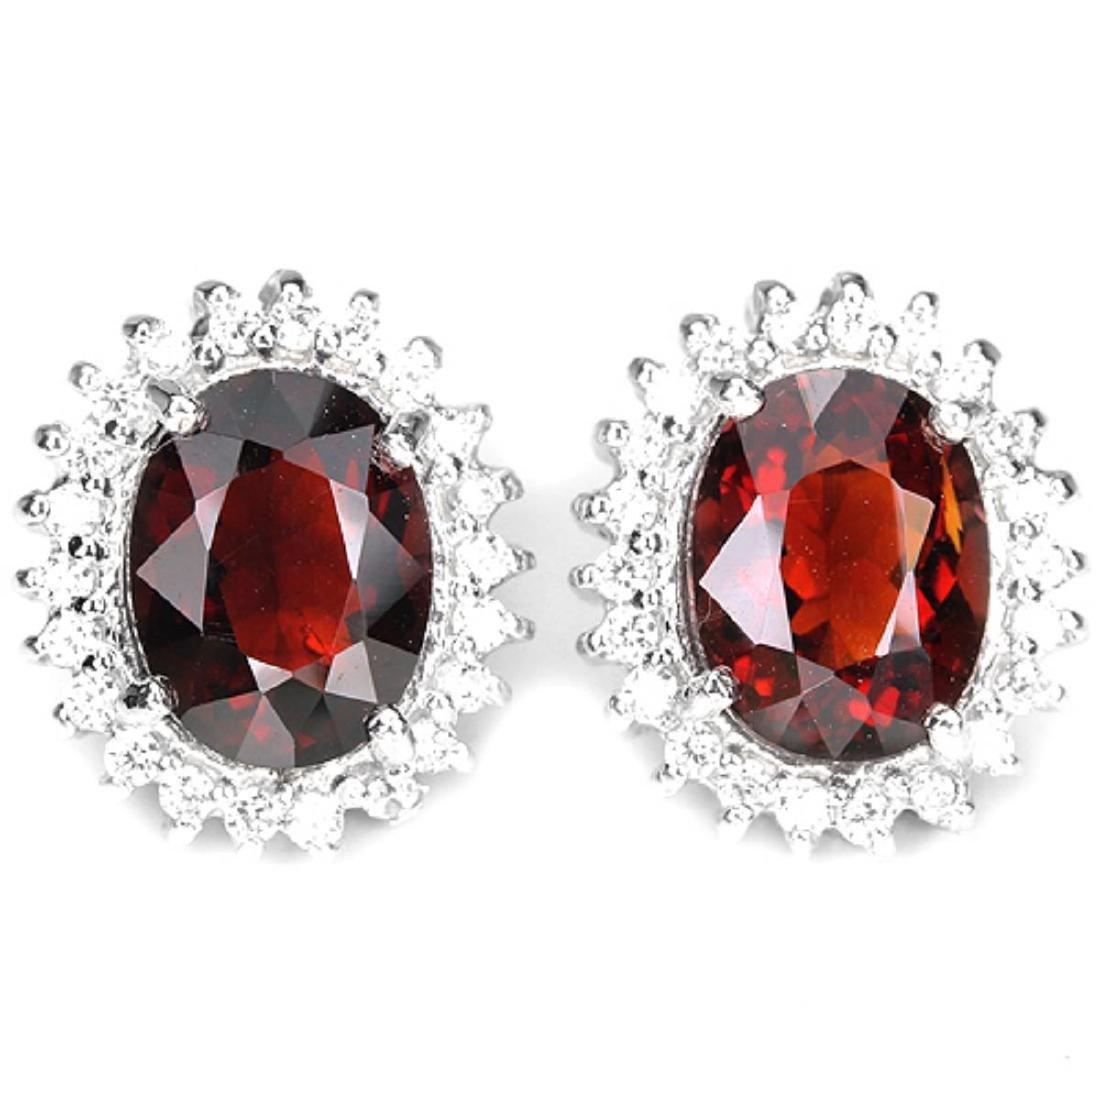 Natural Rhodolite Garnet & CZ Earrings